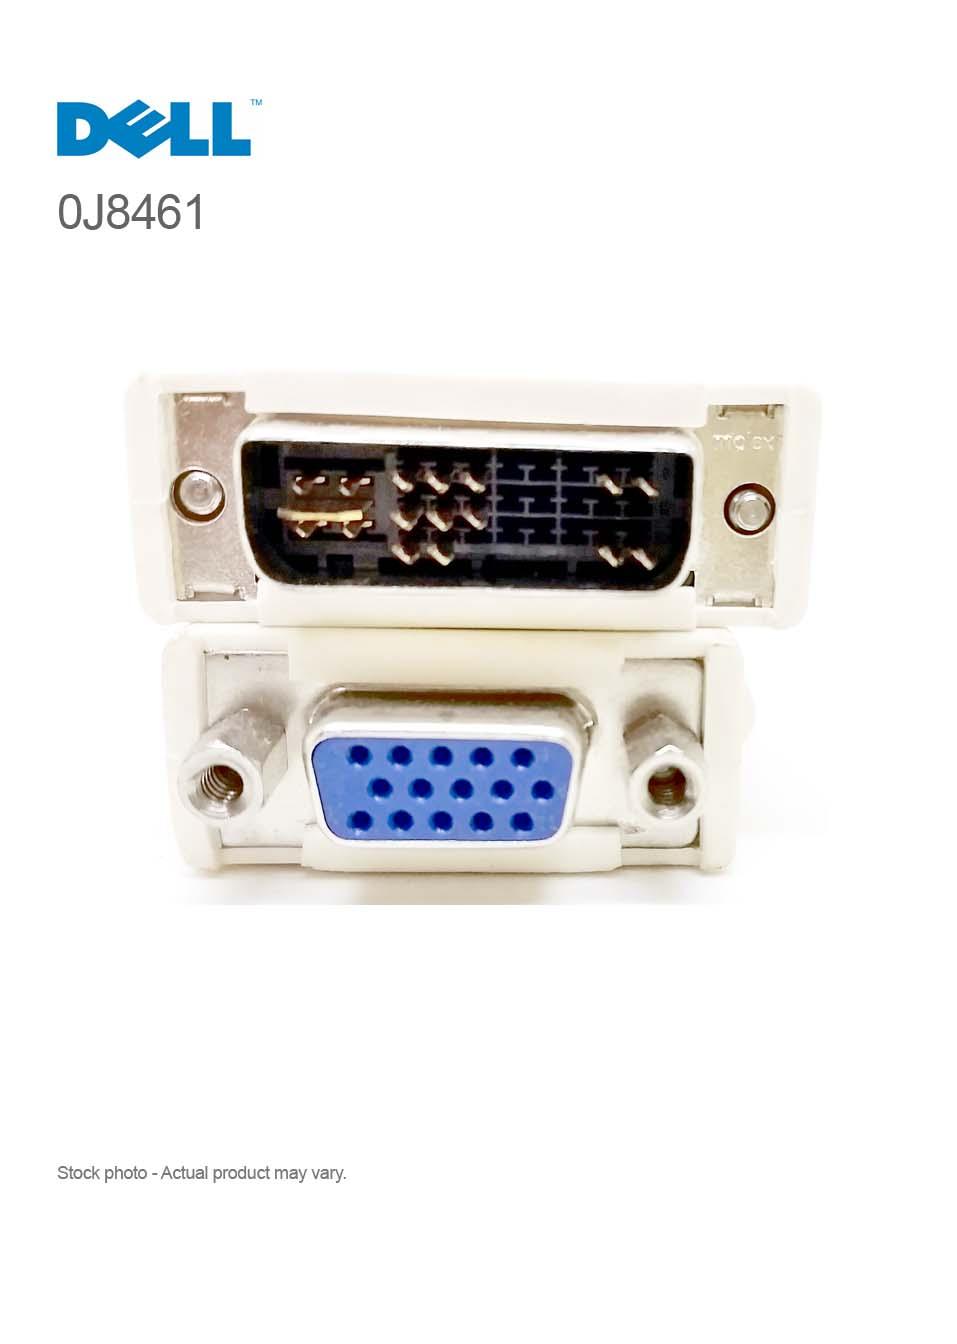 Dell Dvi To Vga Adapter Converter 0j8461 Compupoint Conector Dms 59 Dual Originall